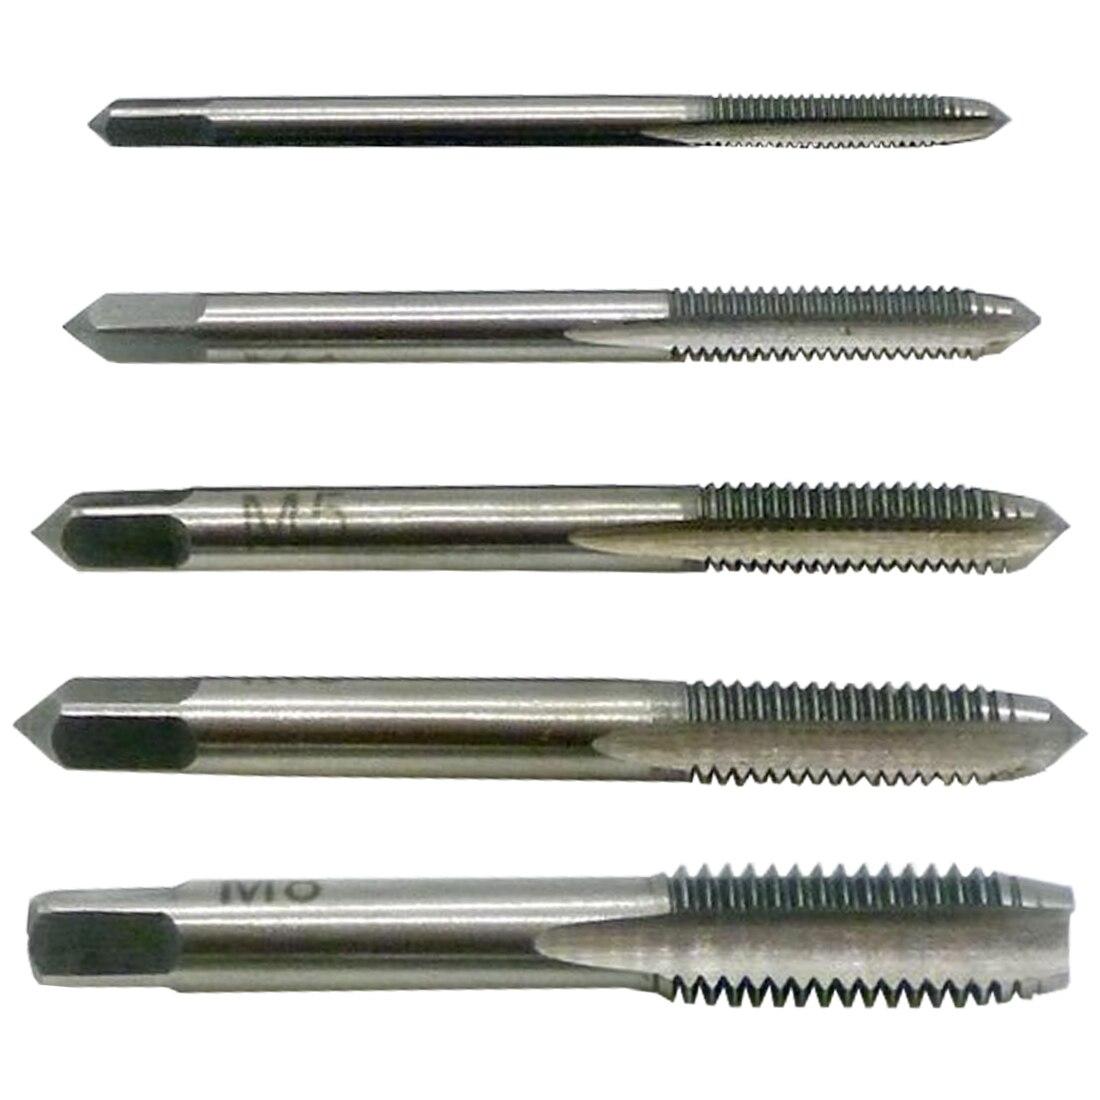 SN-T Metric Taper and Plug Tap M1 x 0.25mm Pitch